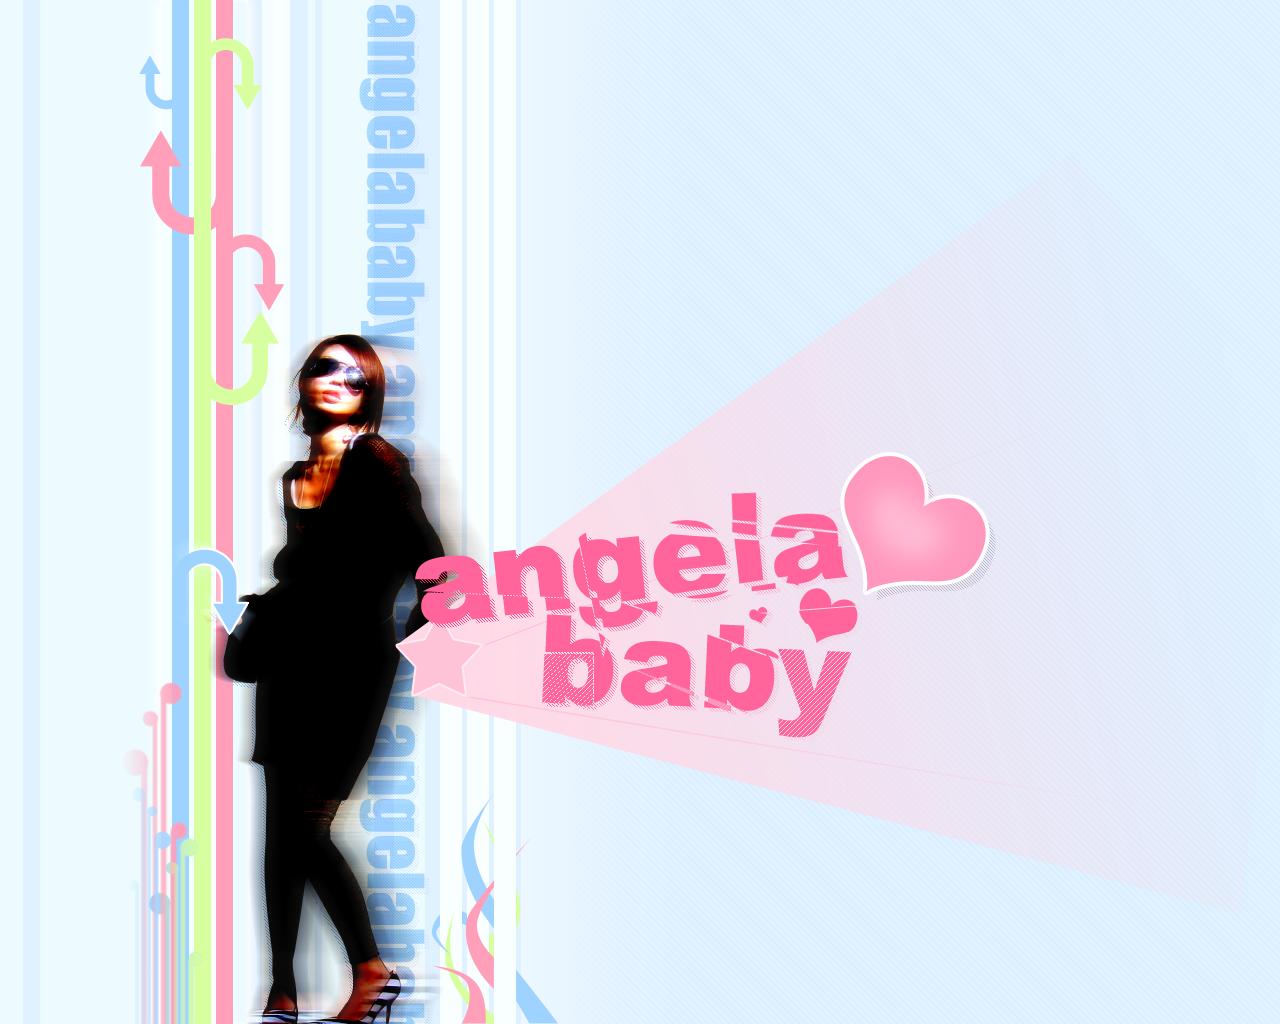 angelababy 2008 - photo #48